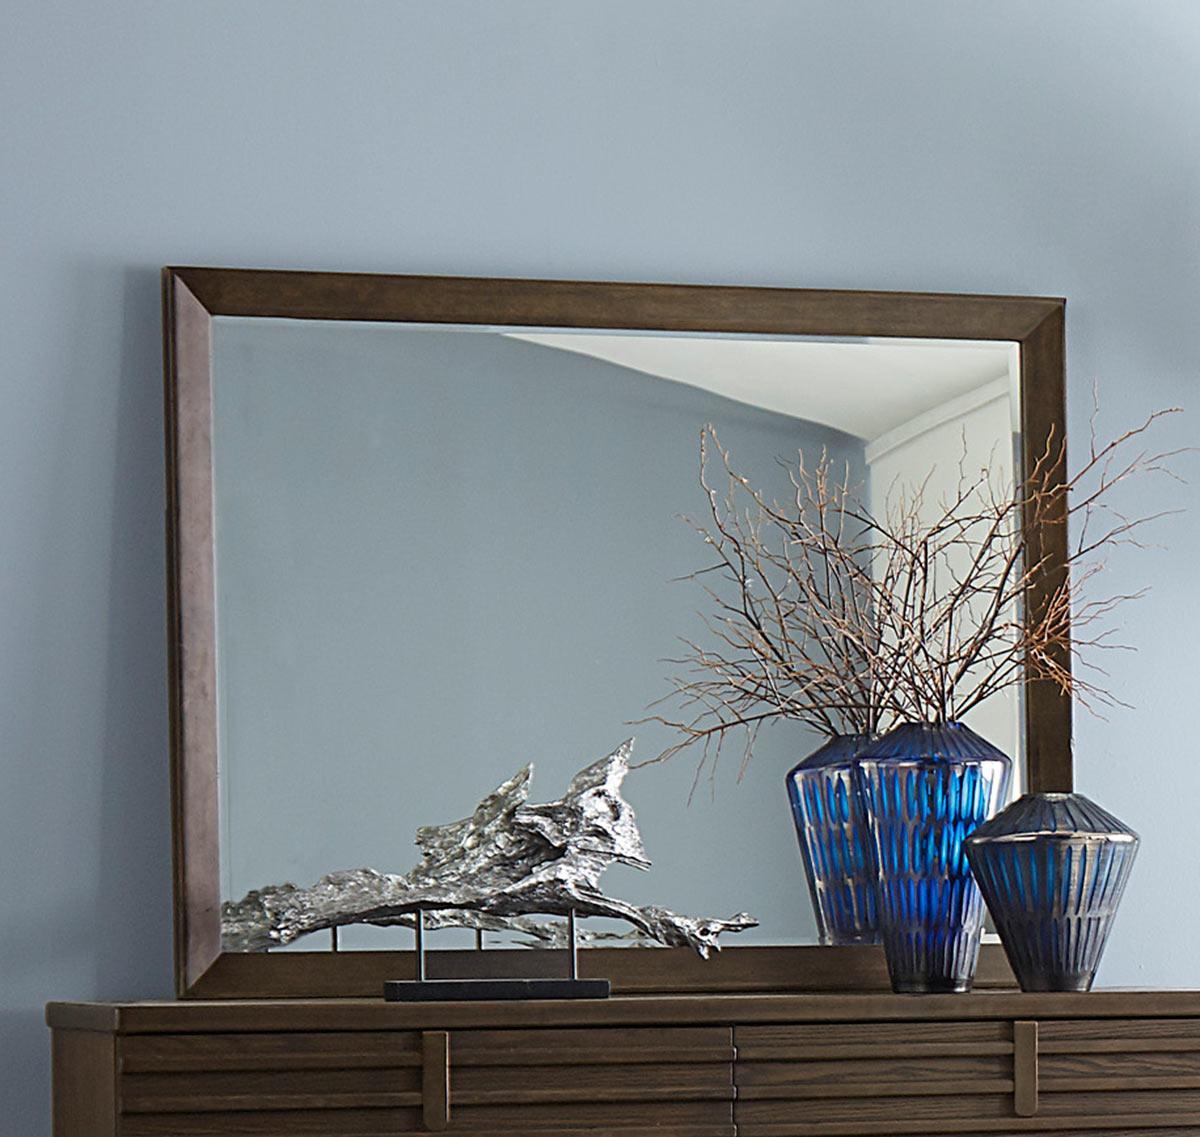 Homelegance Ridgewood Mirror - Rustic Burnished Oak